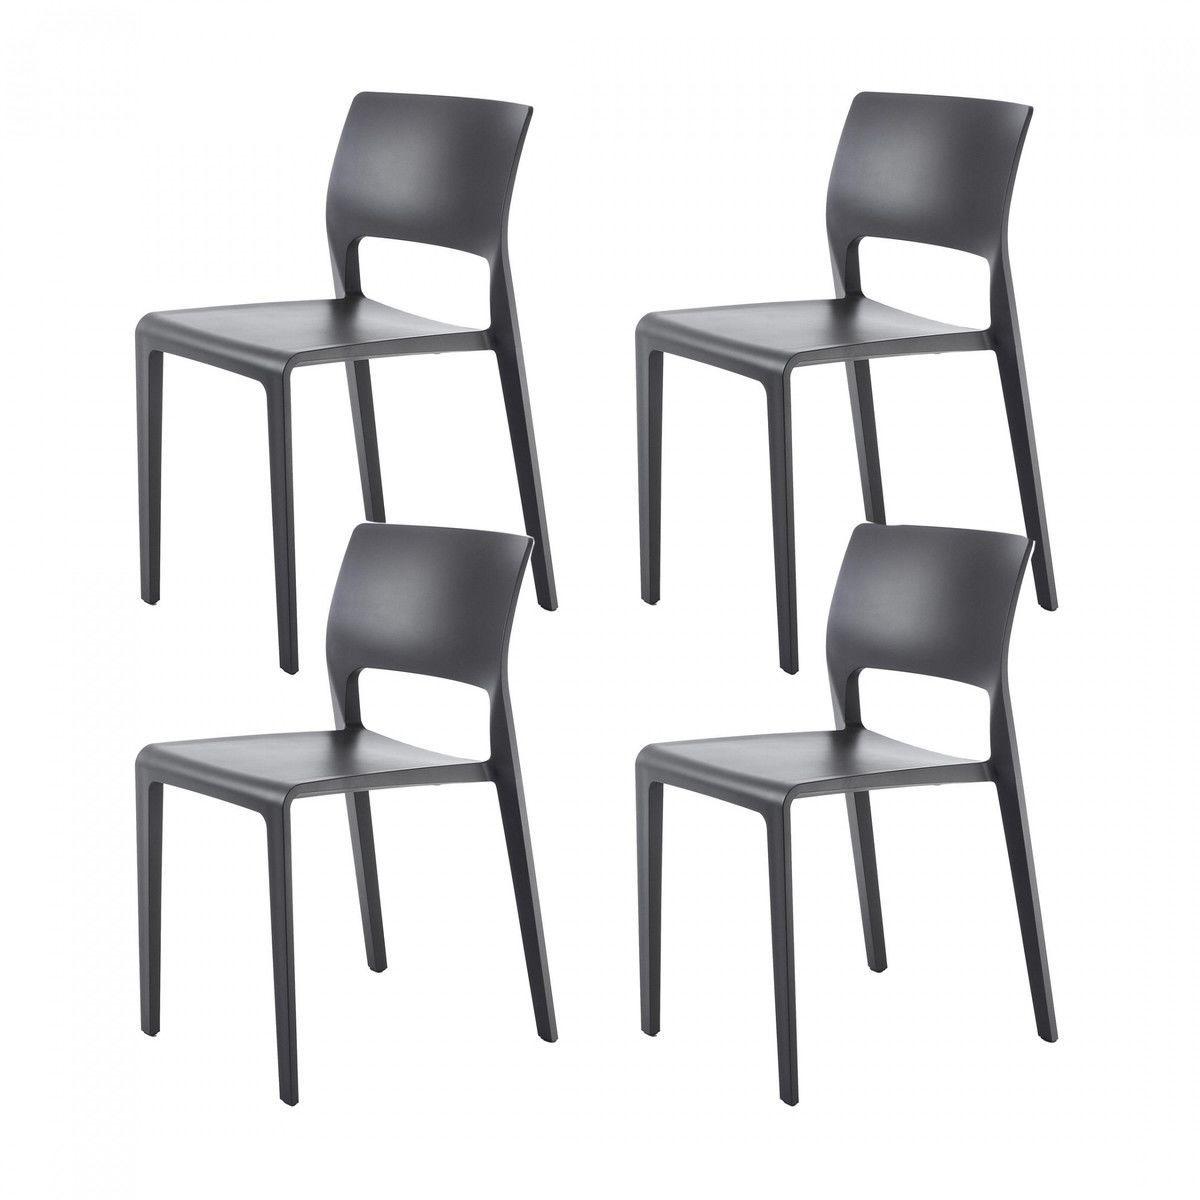 juno 3600 set of 4 chairs arper. Black Bedroom Furniture Sets. Home Design Ideas